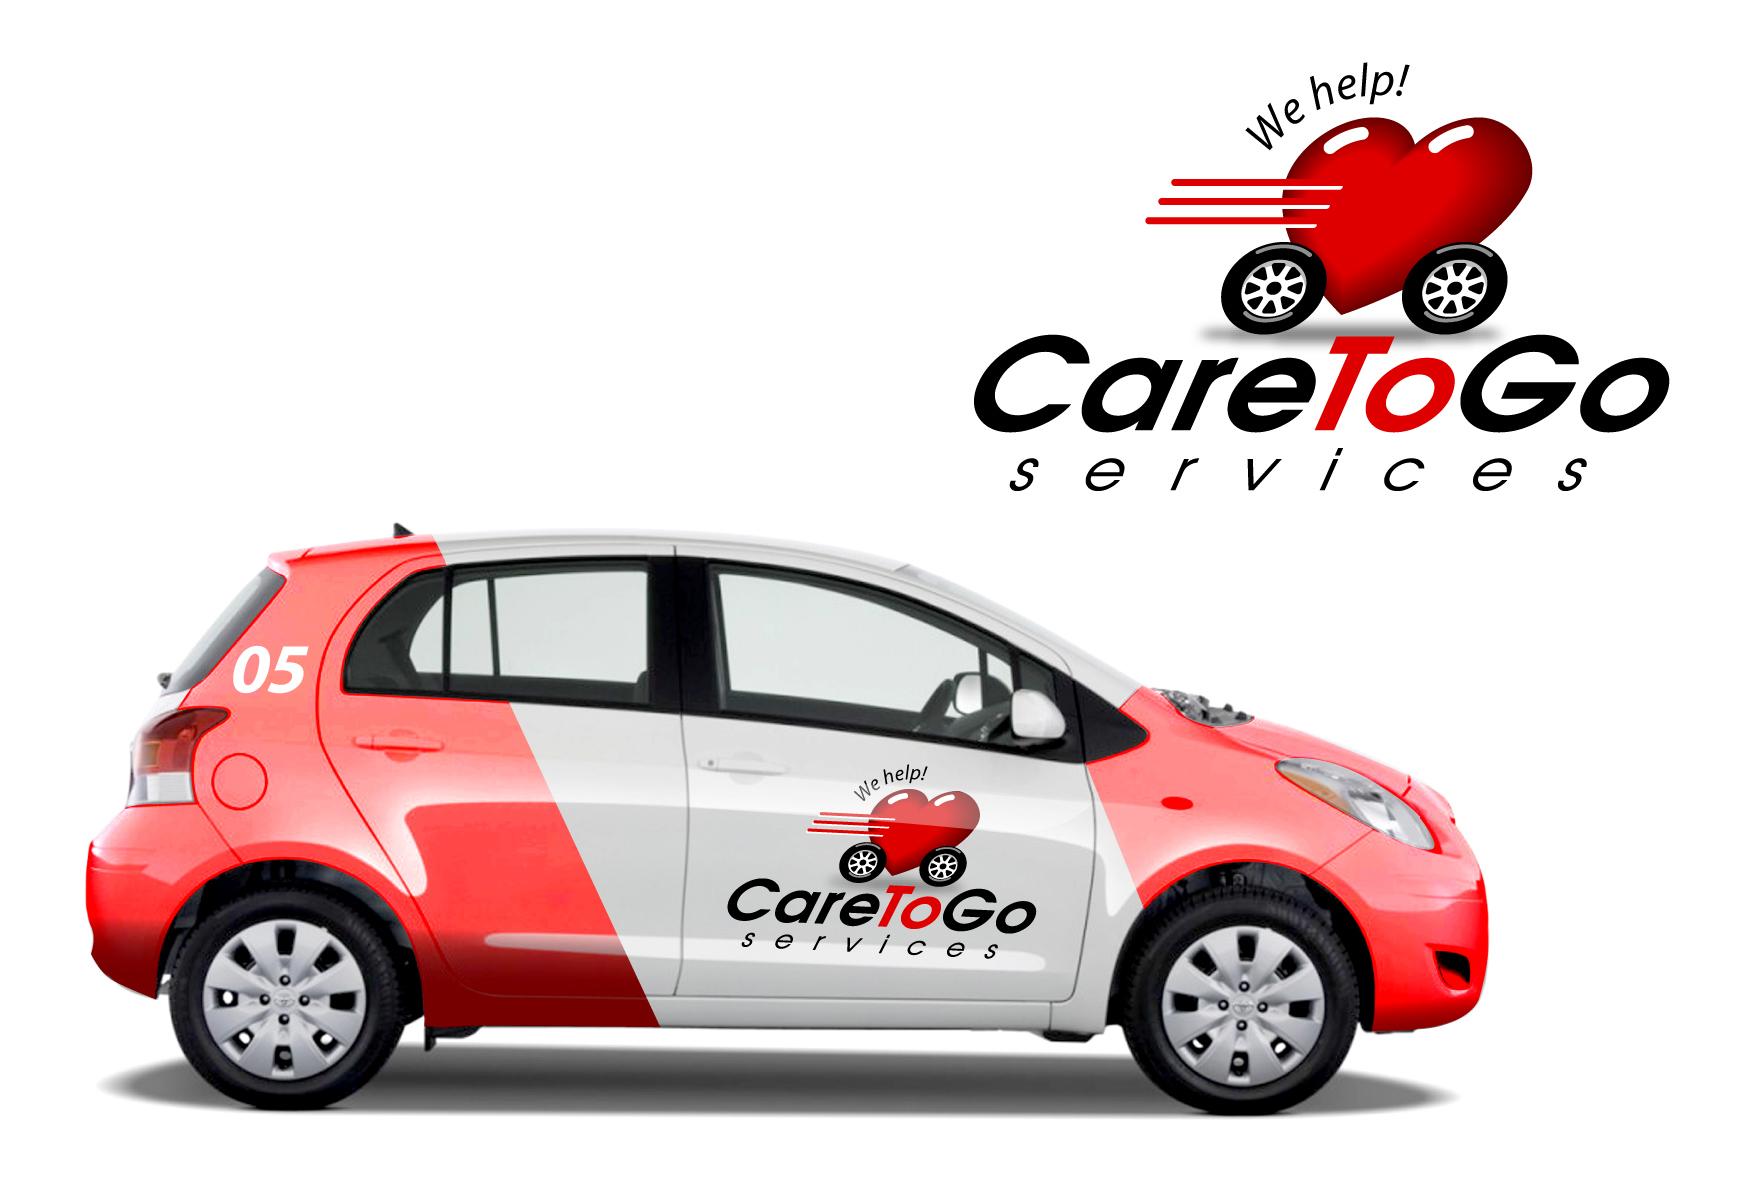 Logo Design by Wilfredo Mendoza - Entry No. 240 in the Logo Design Contest Care To Go Services.